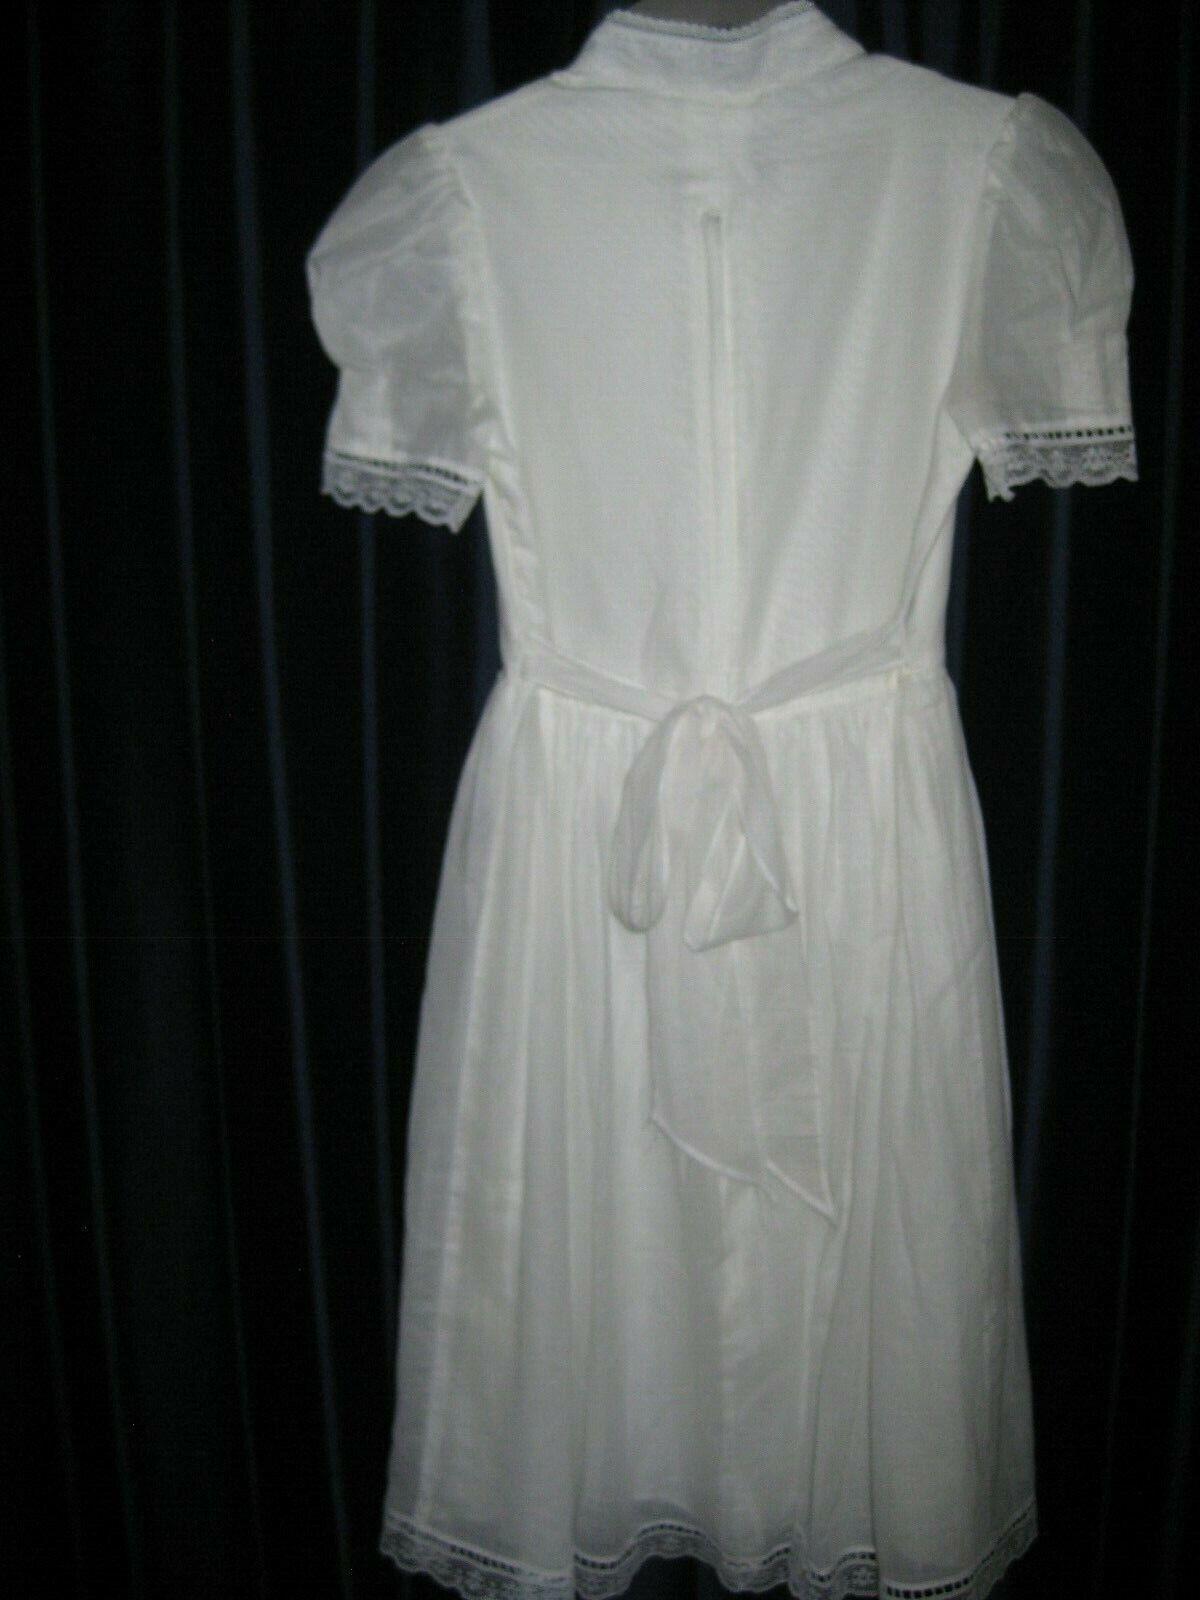 Gunne Sax White Dress Girls Size 12 Pre-Owned - image 6